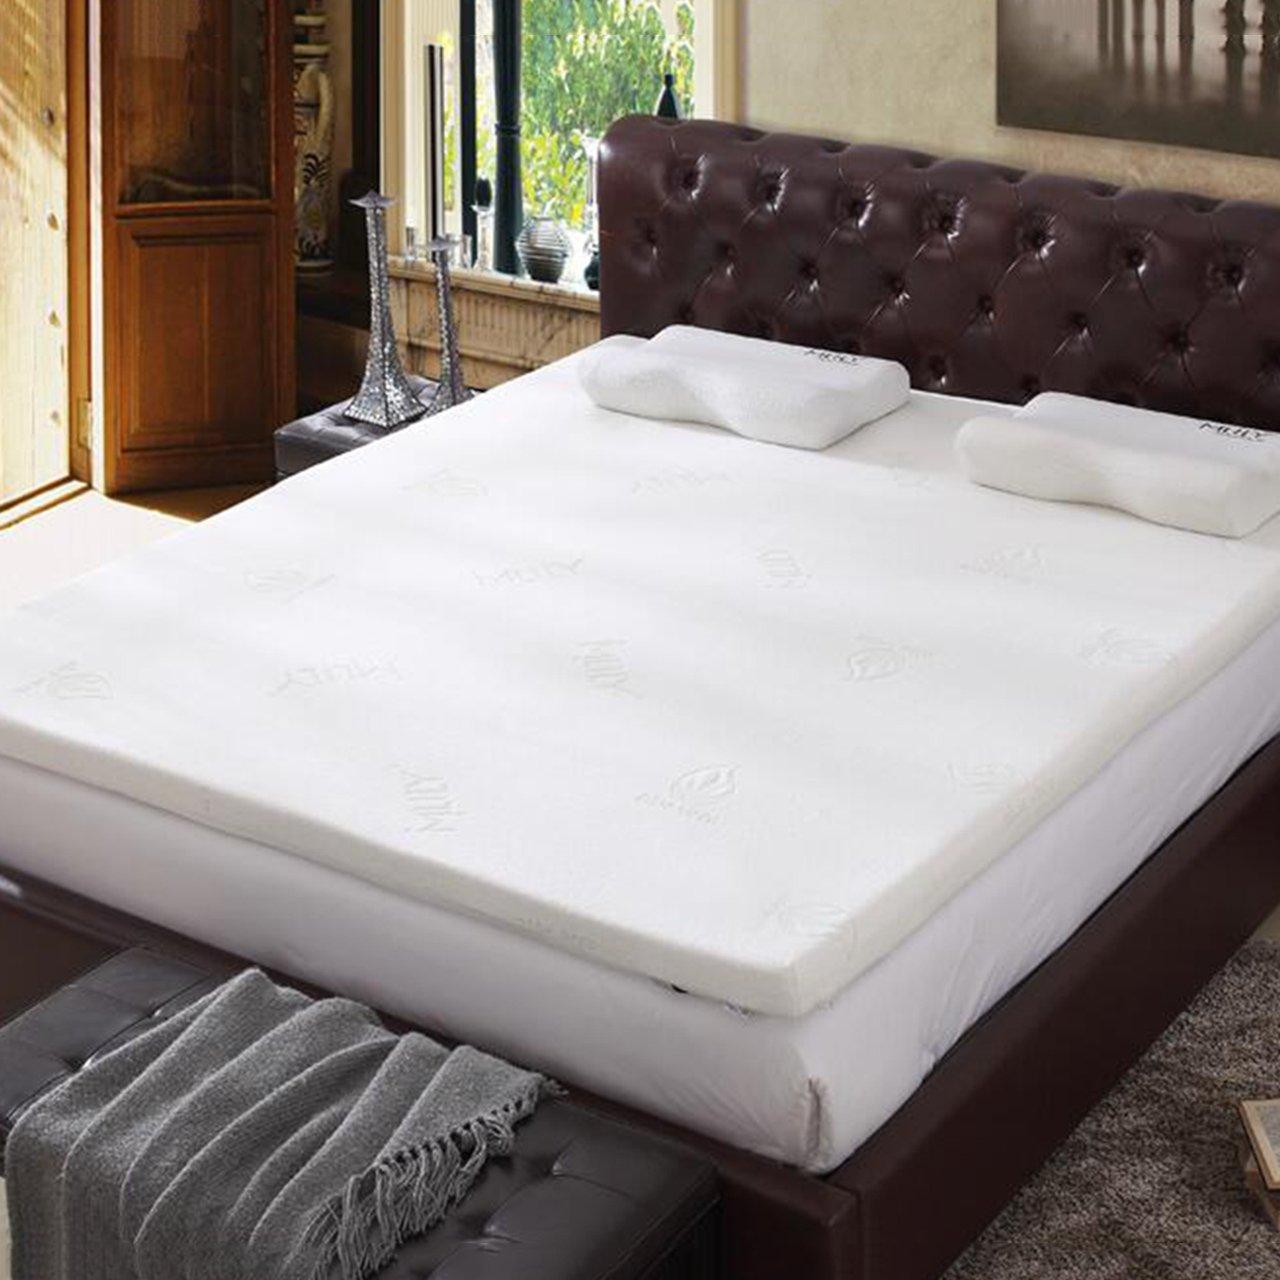 LWXTY Memory-Baumwoll-matratze,Tatami bodenmatte dicken Faltbare sitzkissen matten Student Single größe Bett Schutz pad langsame erholung Schwamm doppelmatratze-A 180x200cm(71x79inch)